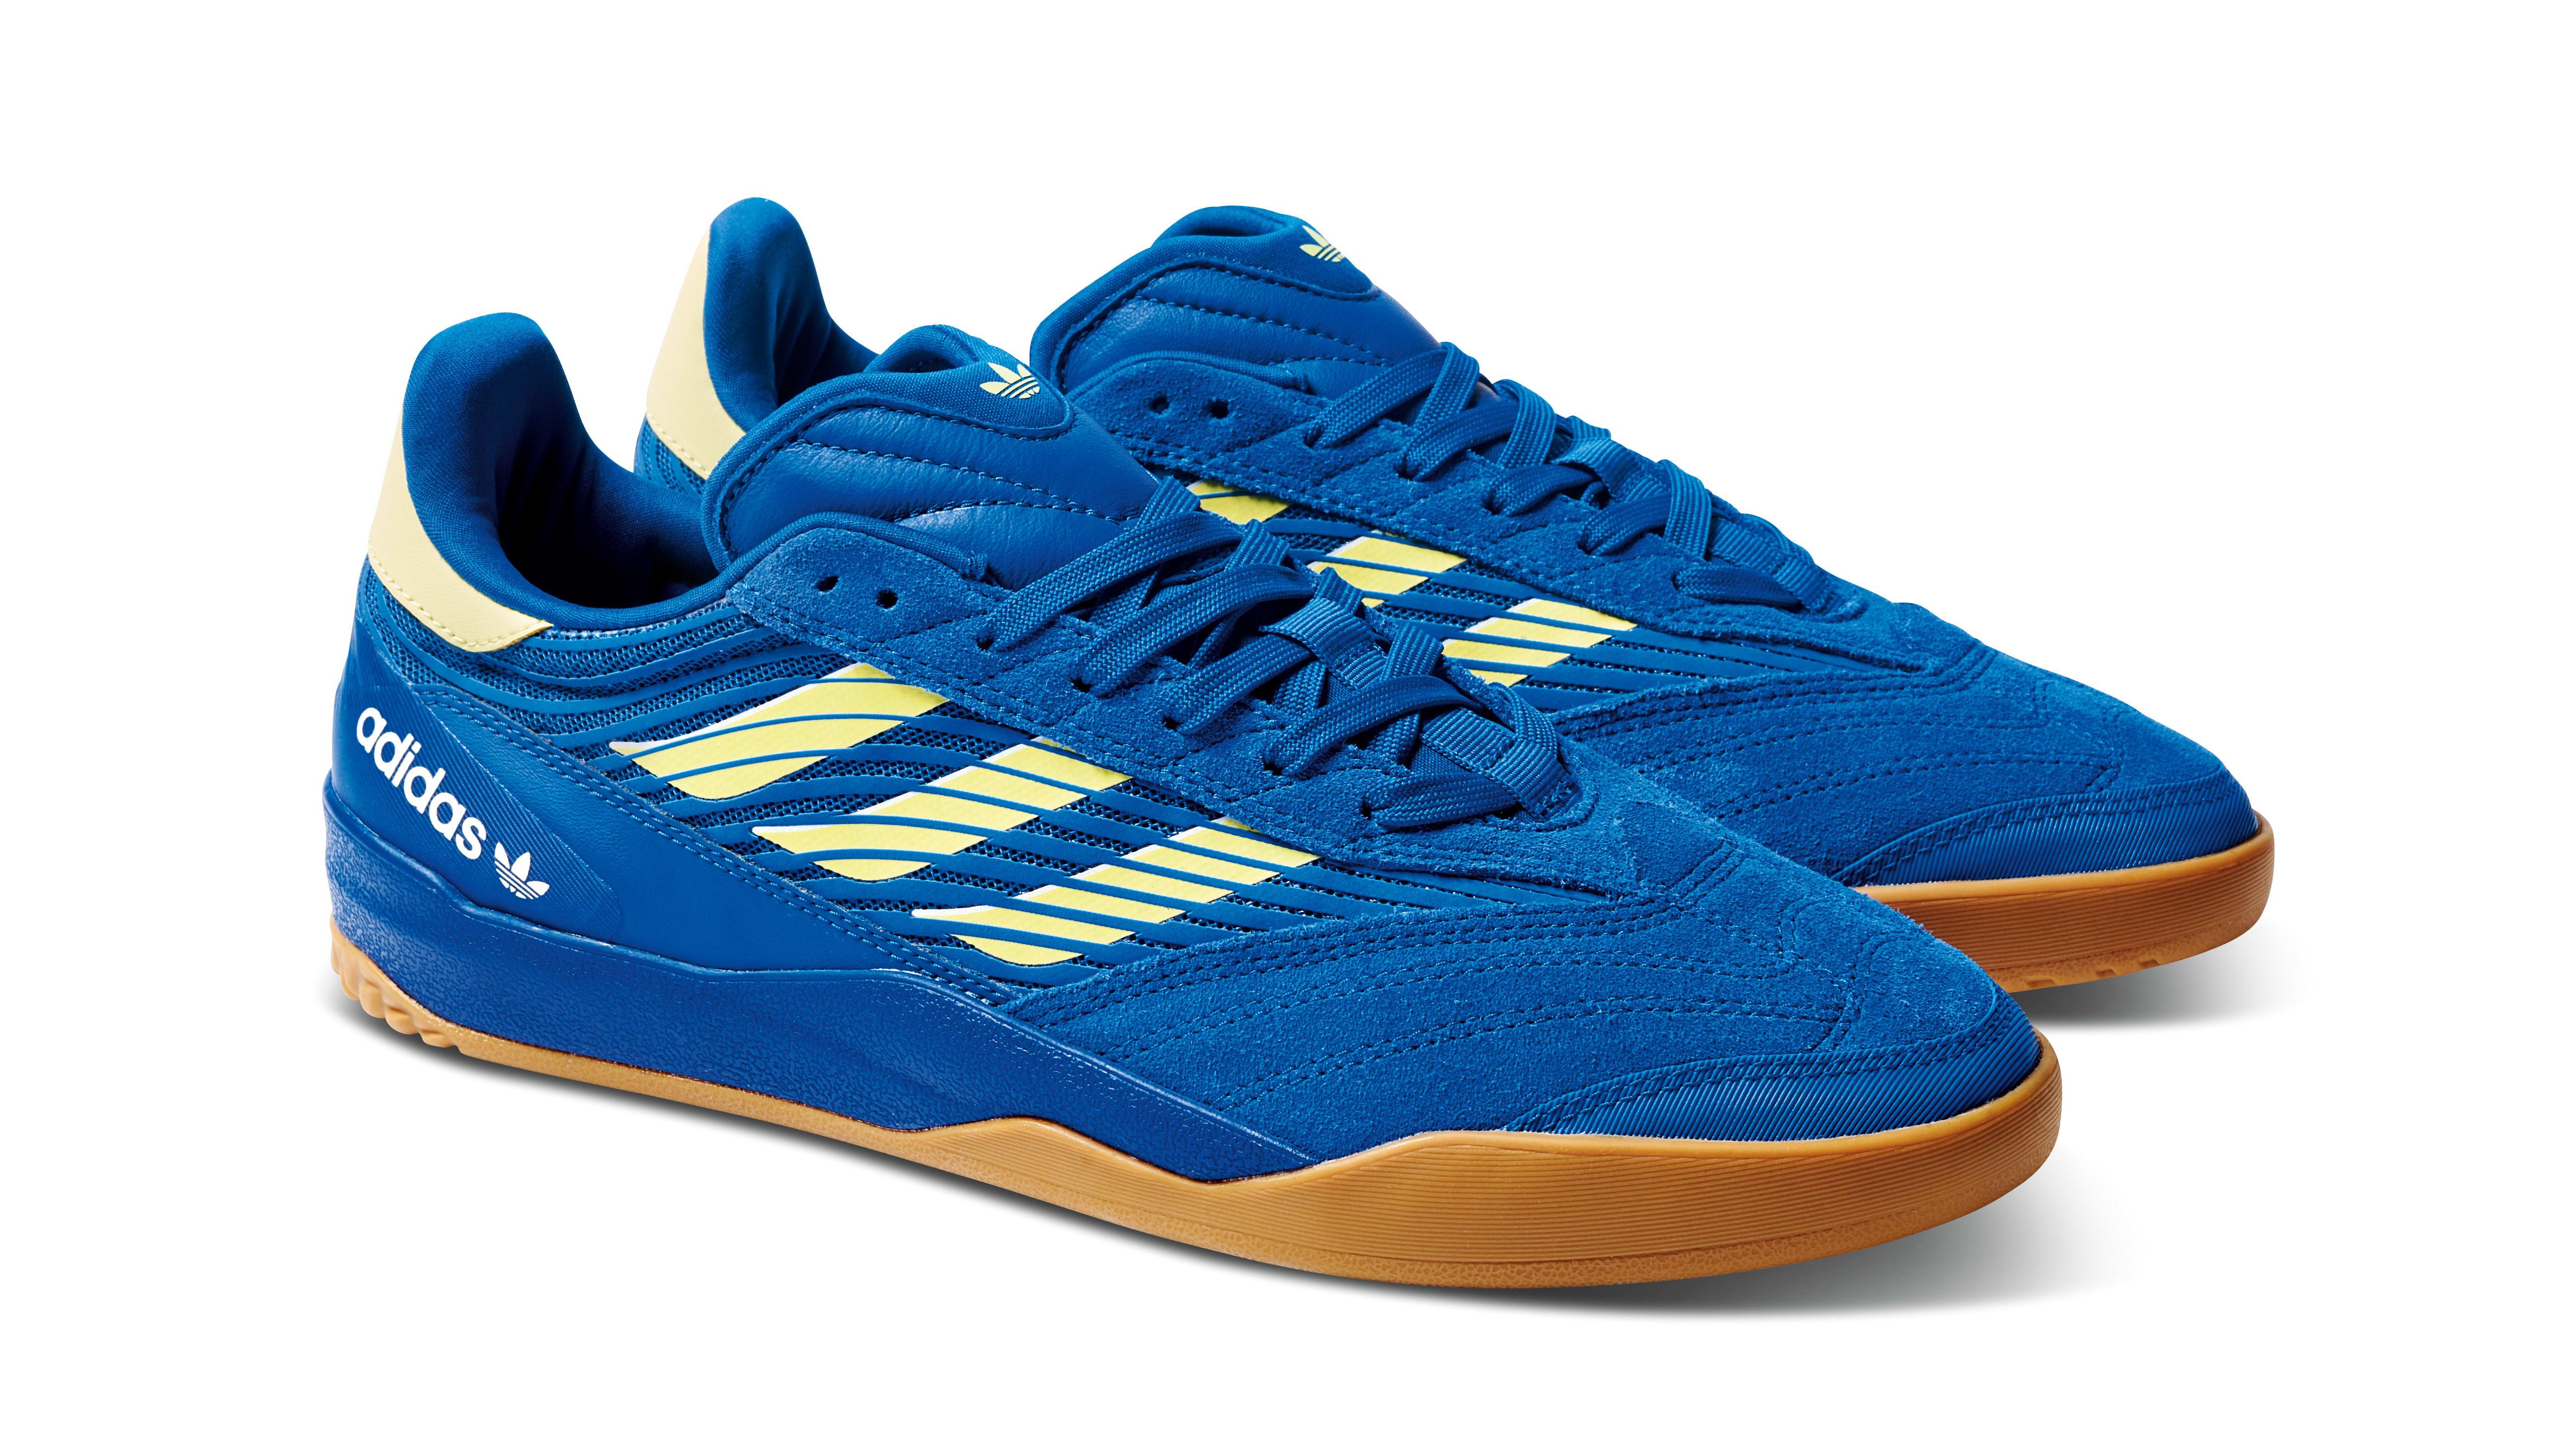 adidas-skateboarding-copa-nationale-eg2272-pair